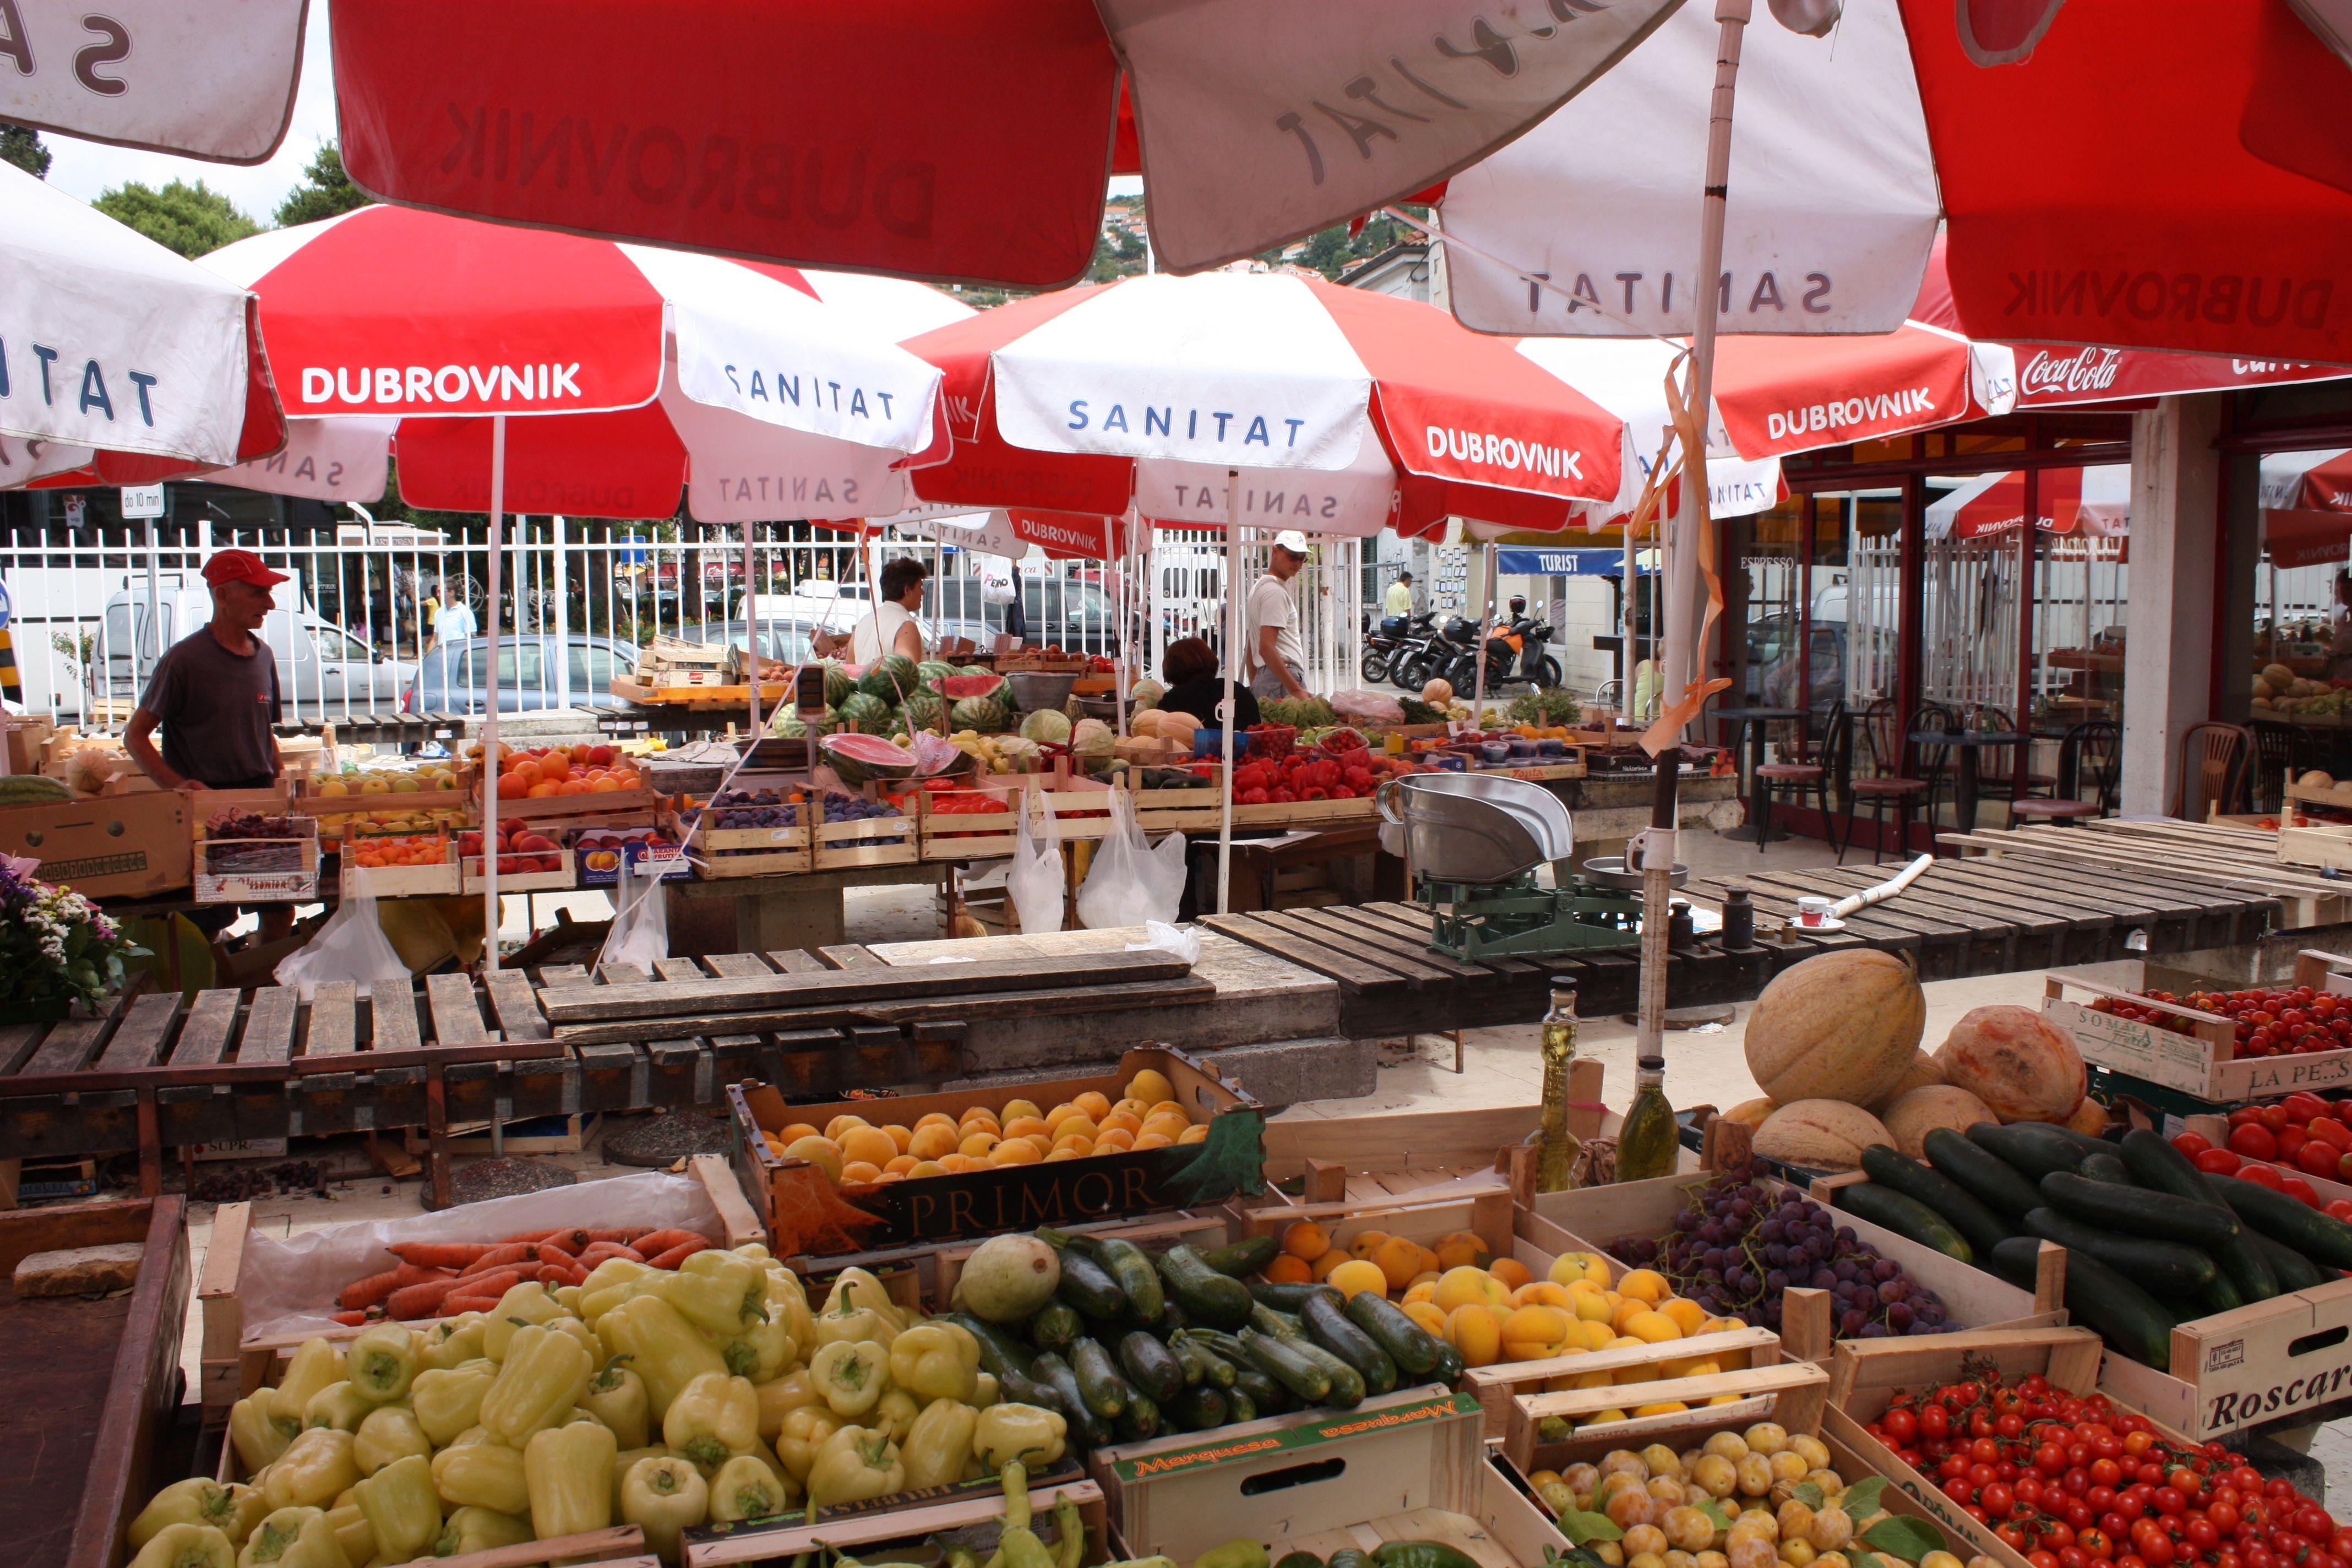 Dubrovnik farmer's market